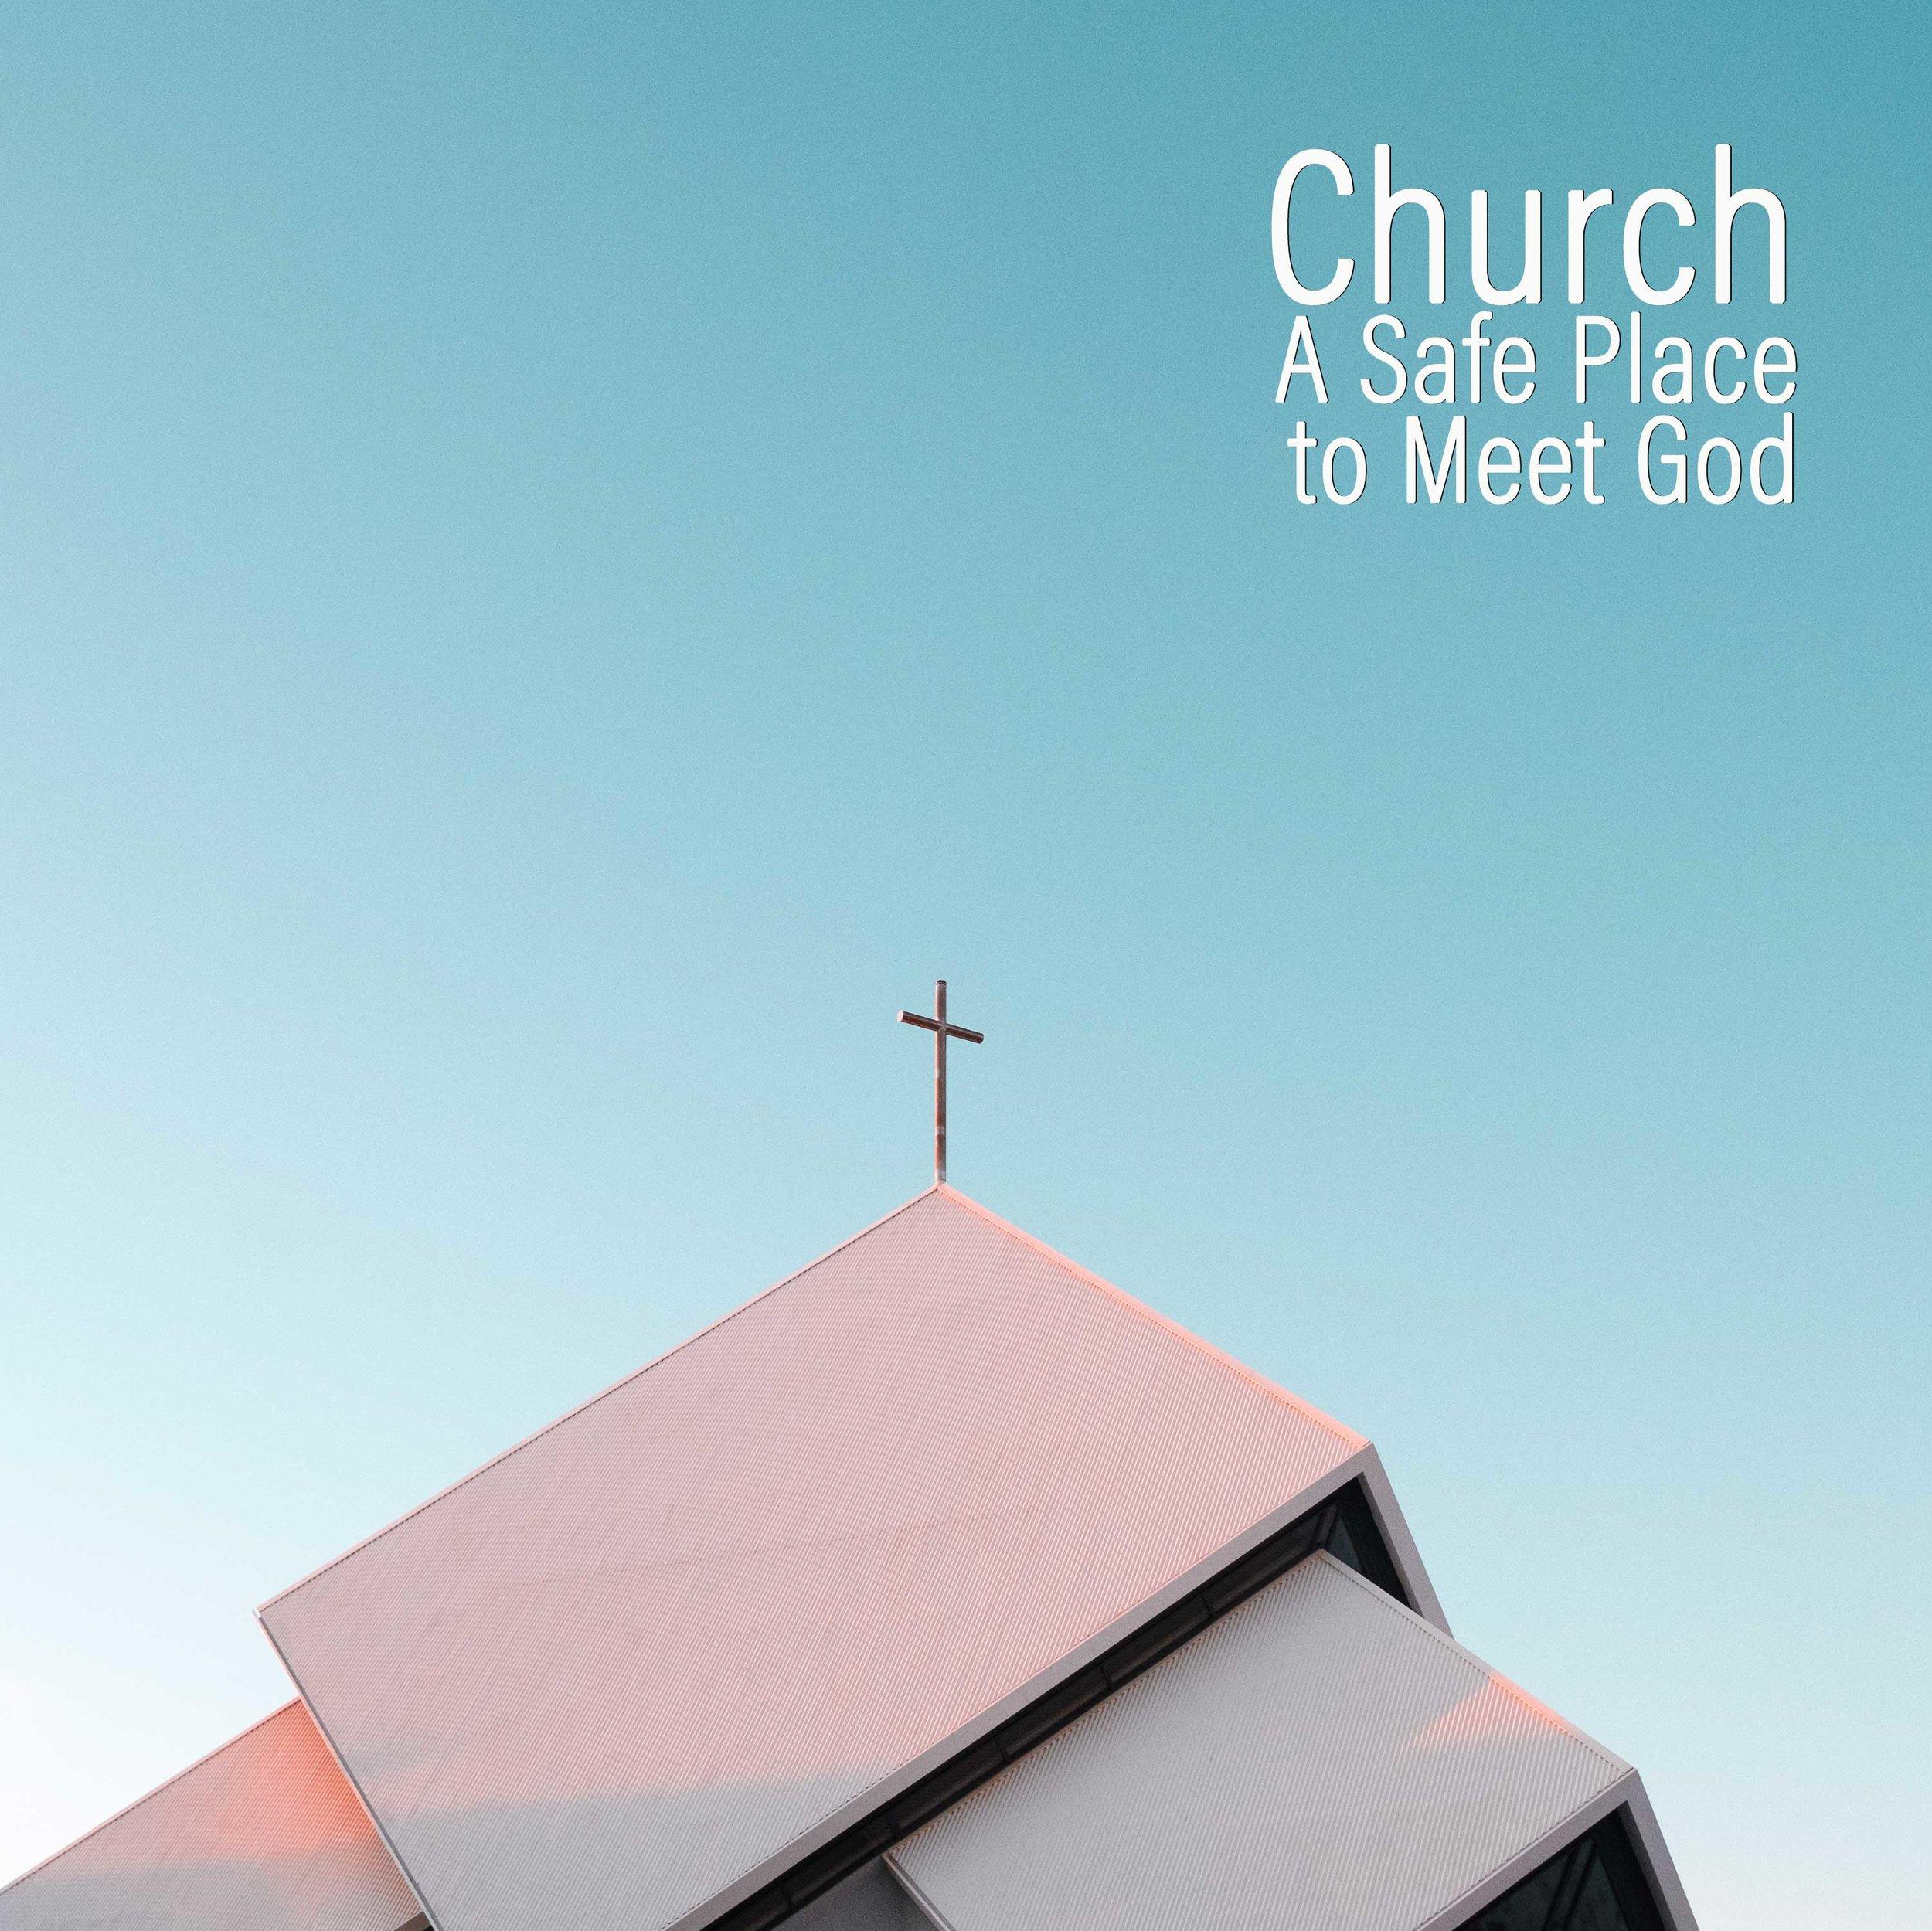 akira-hojo-502567-unsplash church safe place 1x1 - v2.jpg